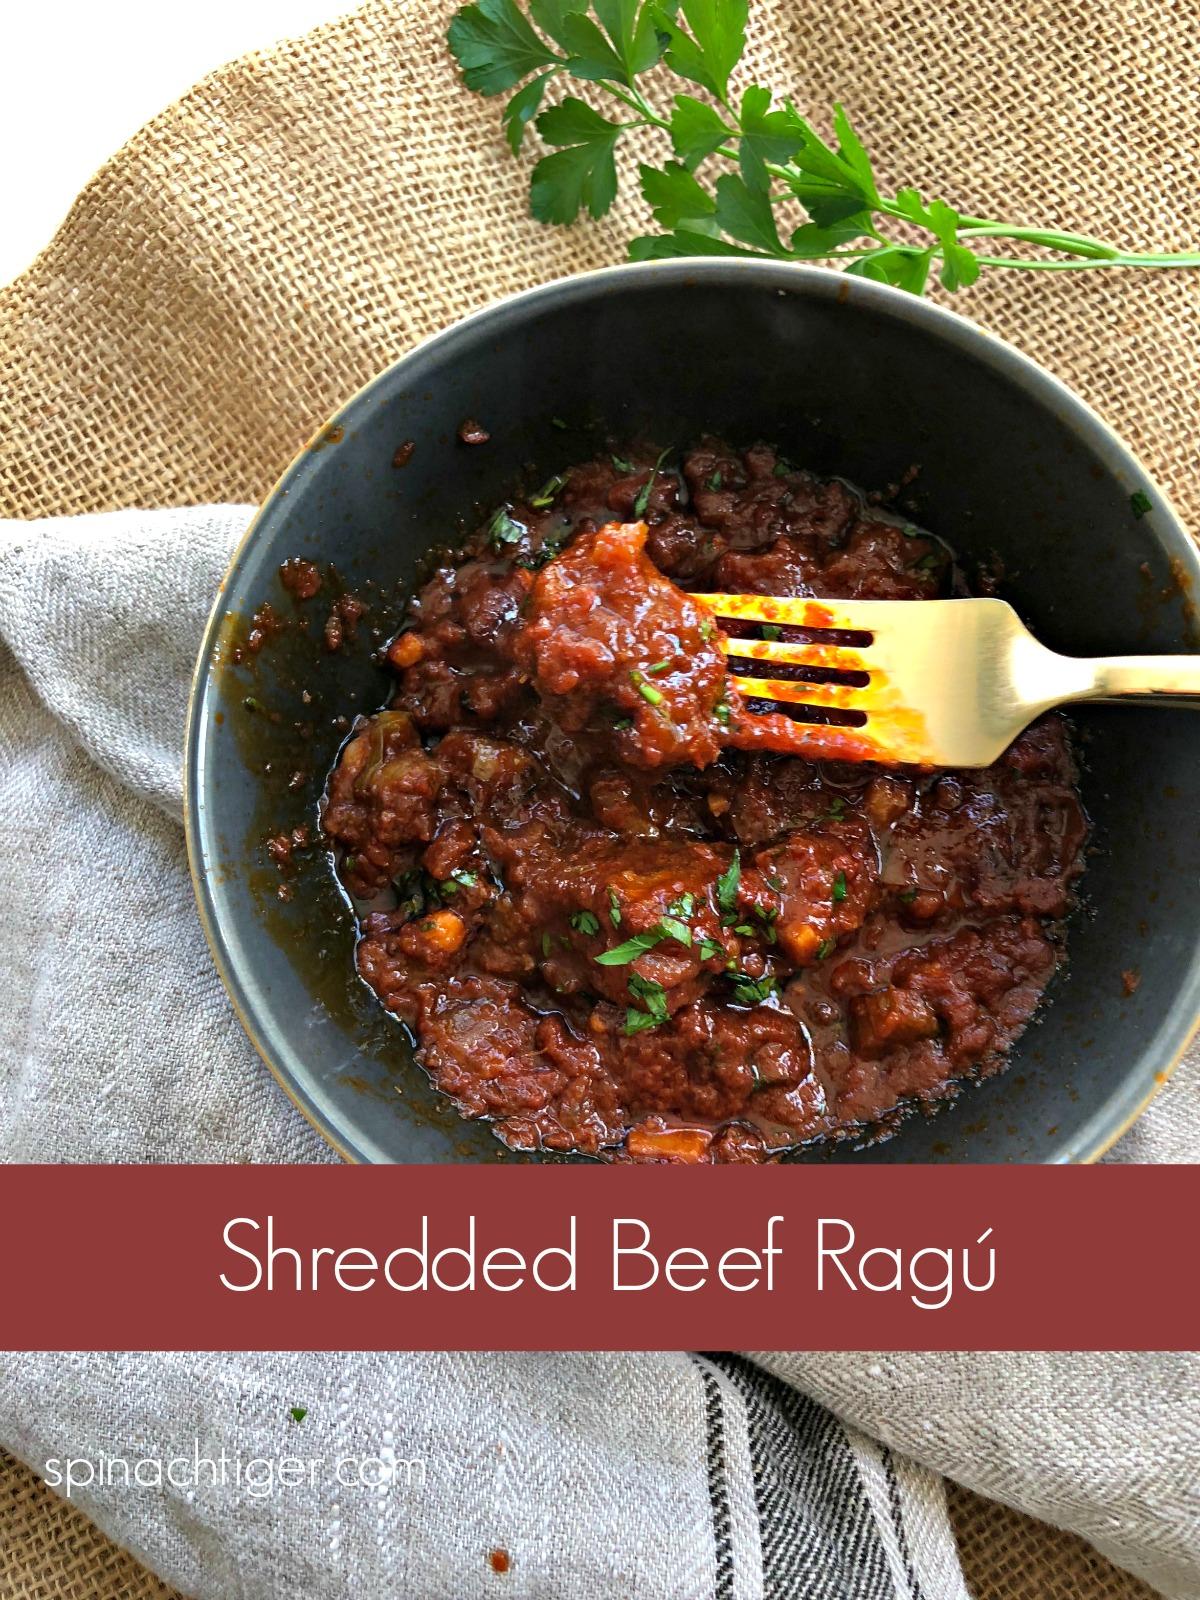 Italian Shredded Beef Ragu